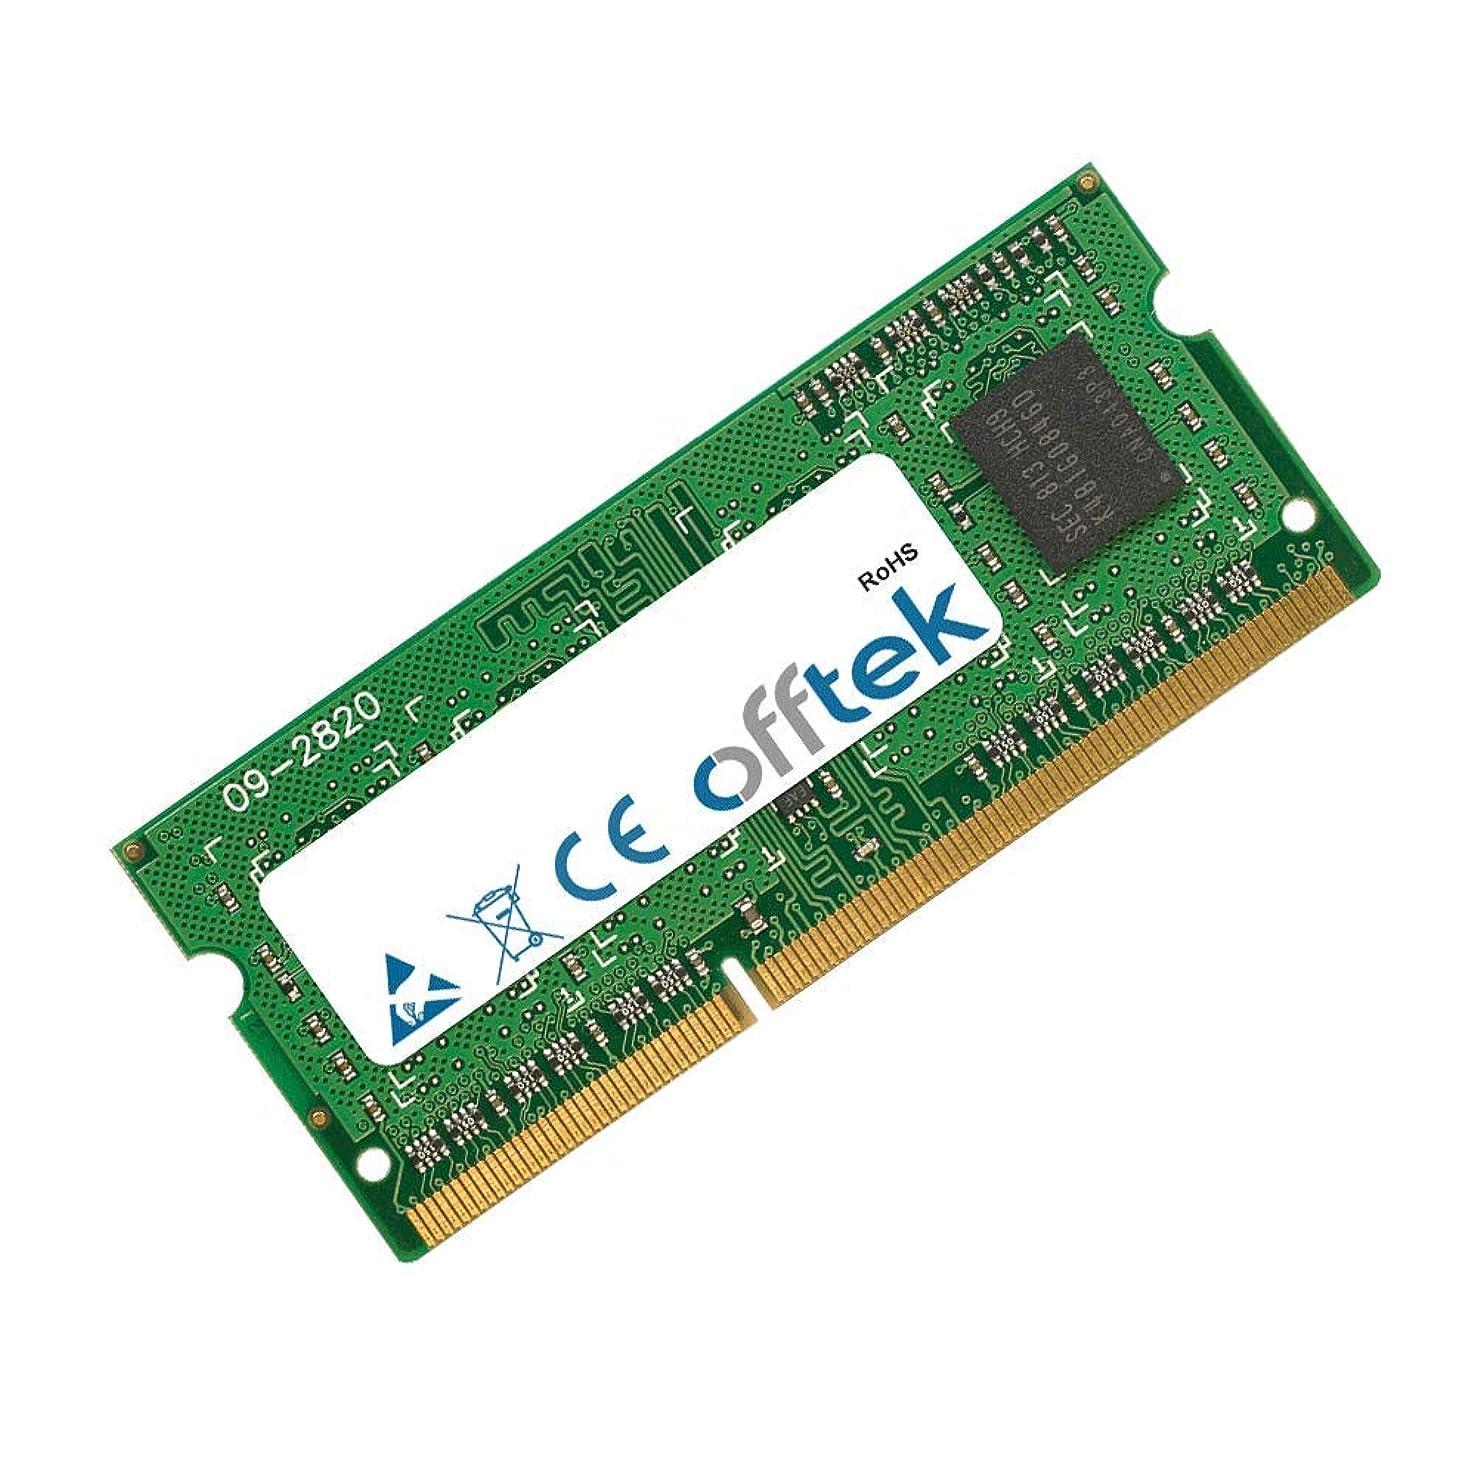 8GB RAM Memory for Asus Q501LA (DDR3-12800) - Laptop Memory Upgrade from OFFTEK